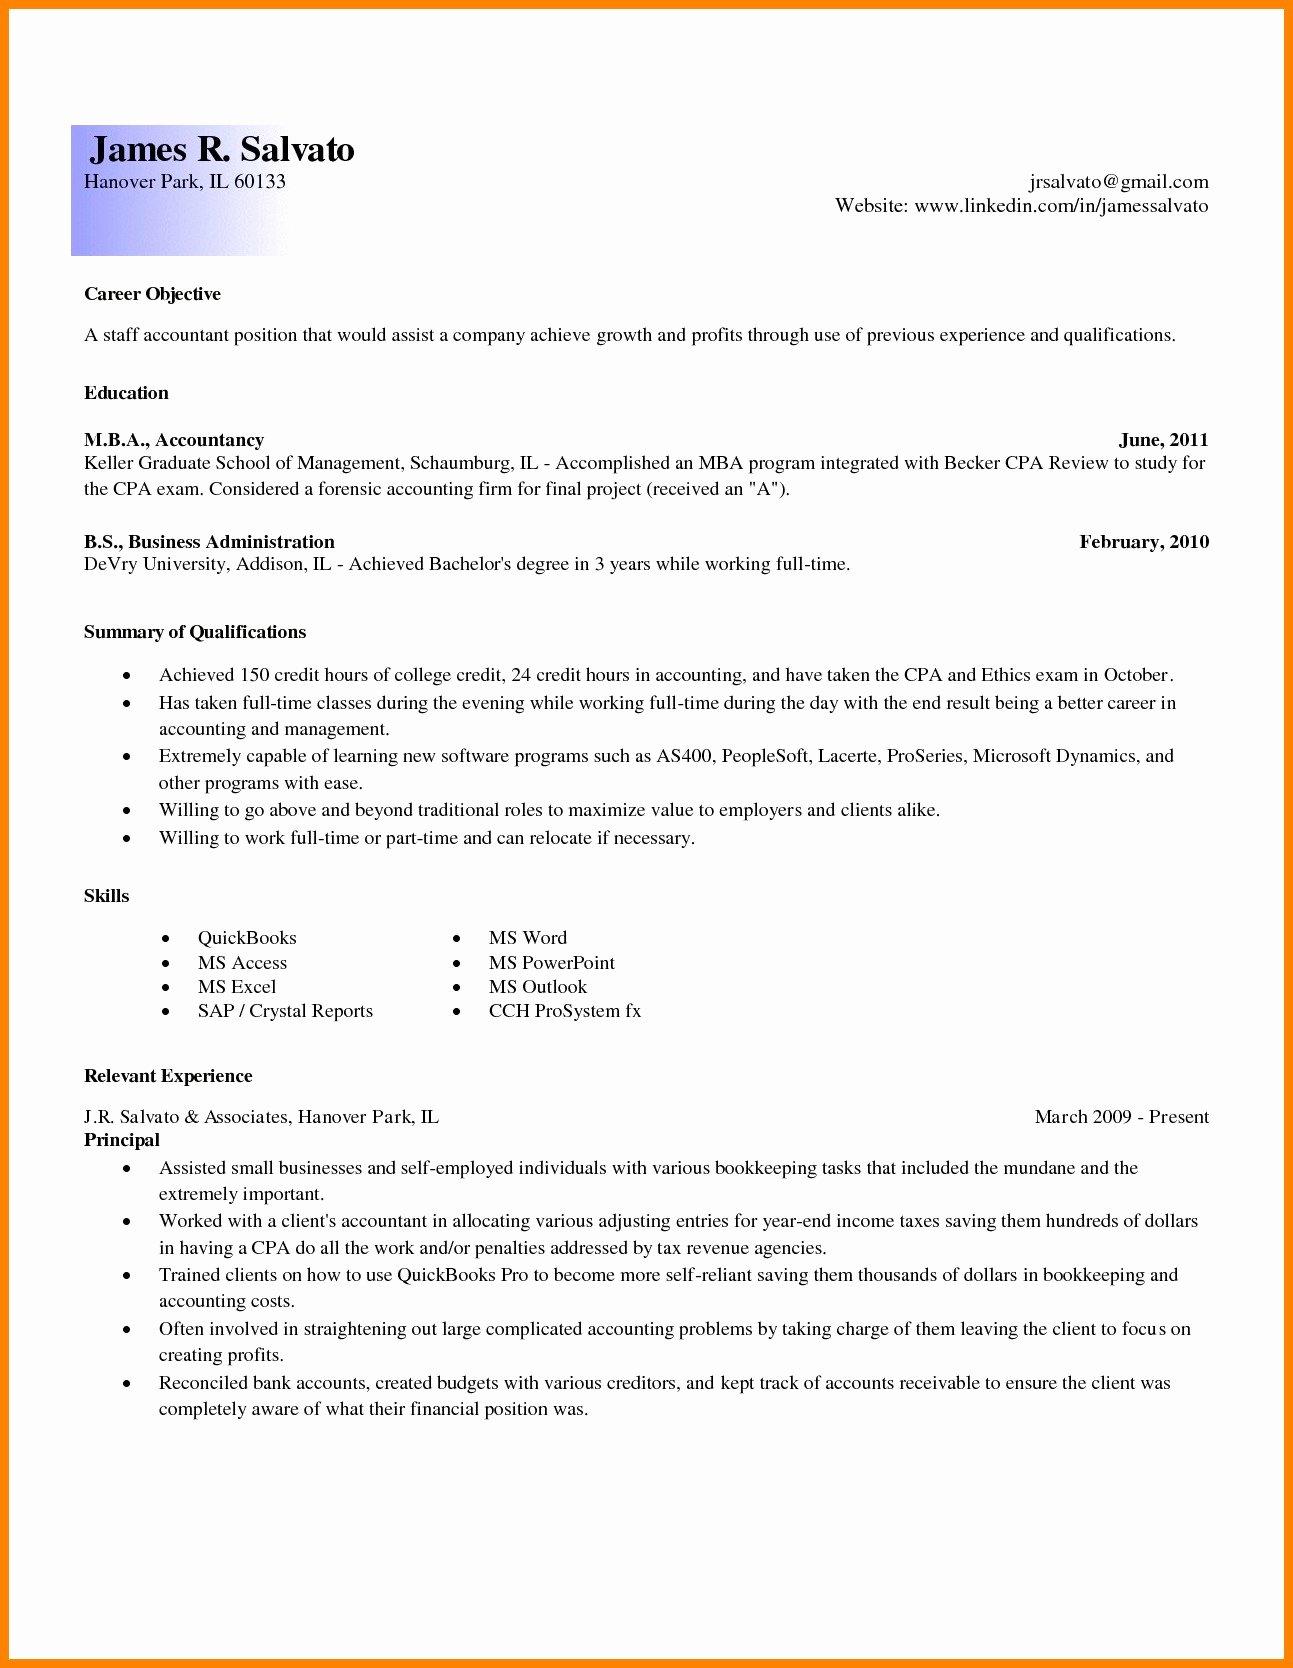 Professional Profile Resume 7 Examples